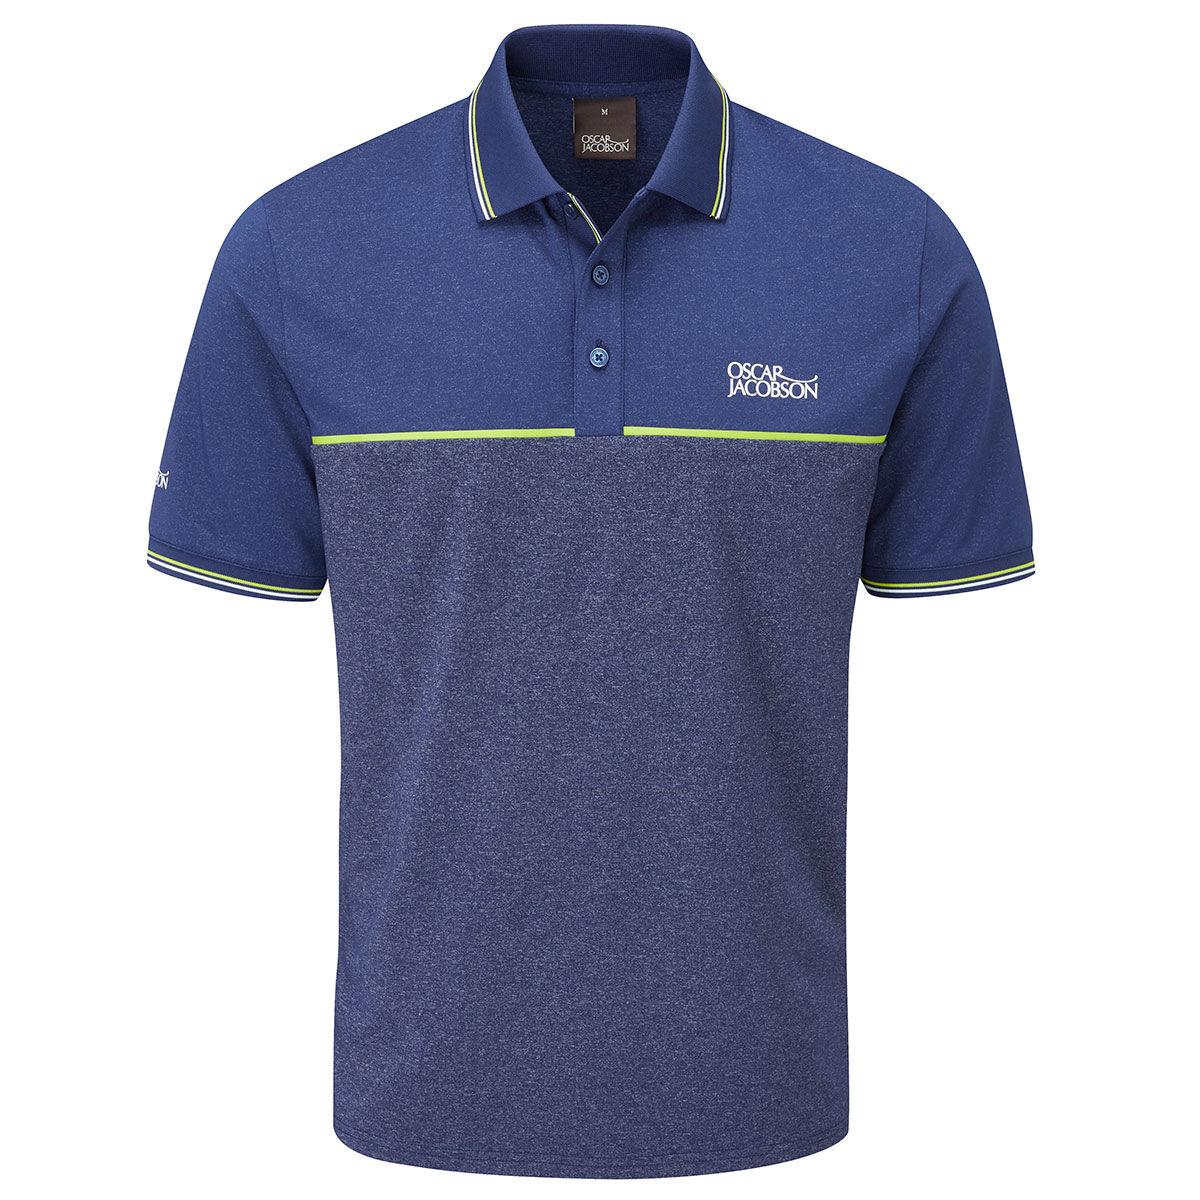 Oscar Jacobson Belford Golf Polo Shirt, Mens, Small, Navy marl | American Golf